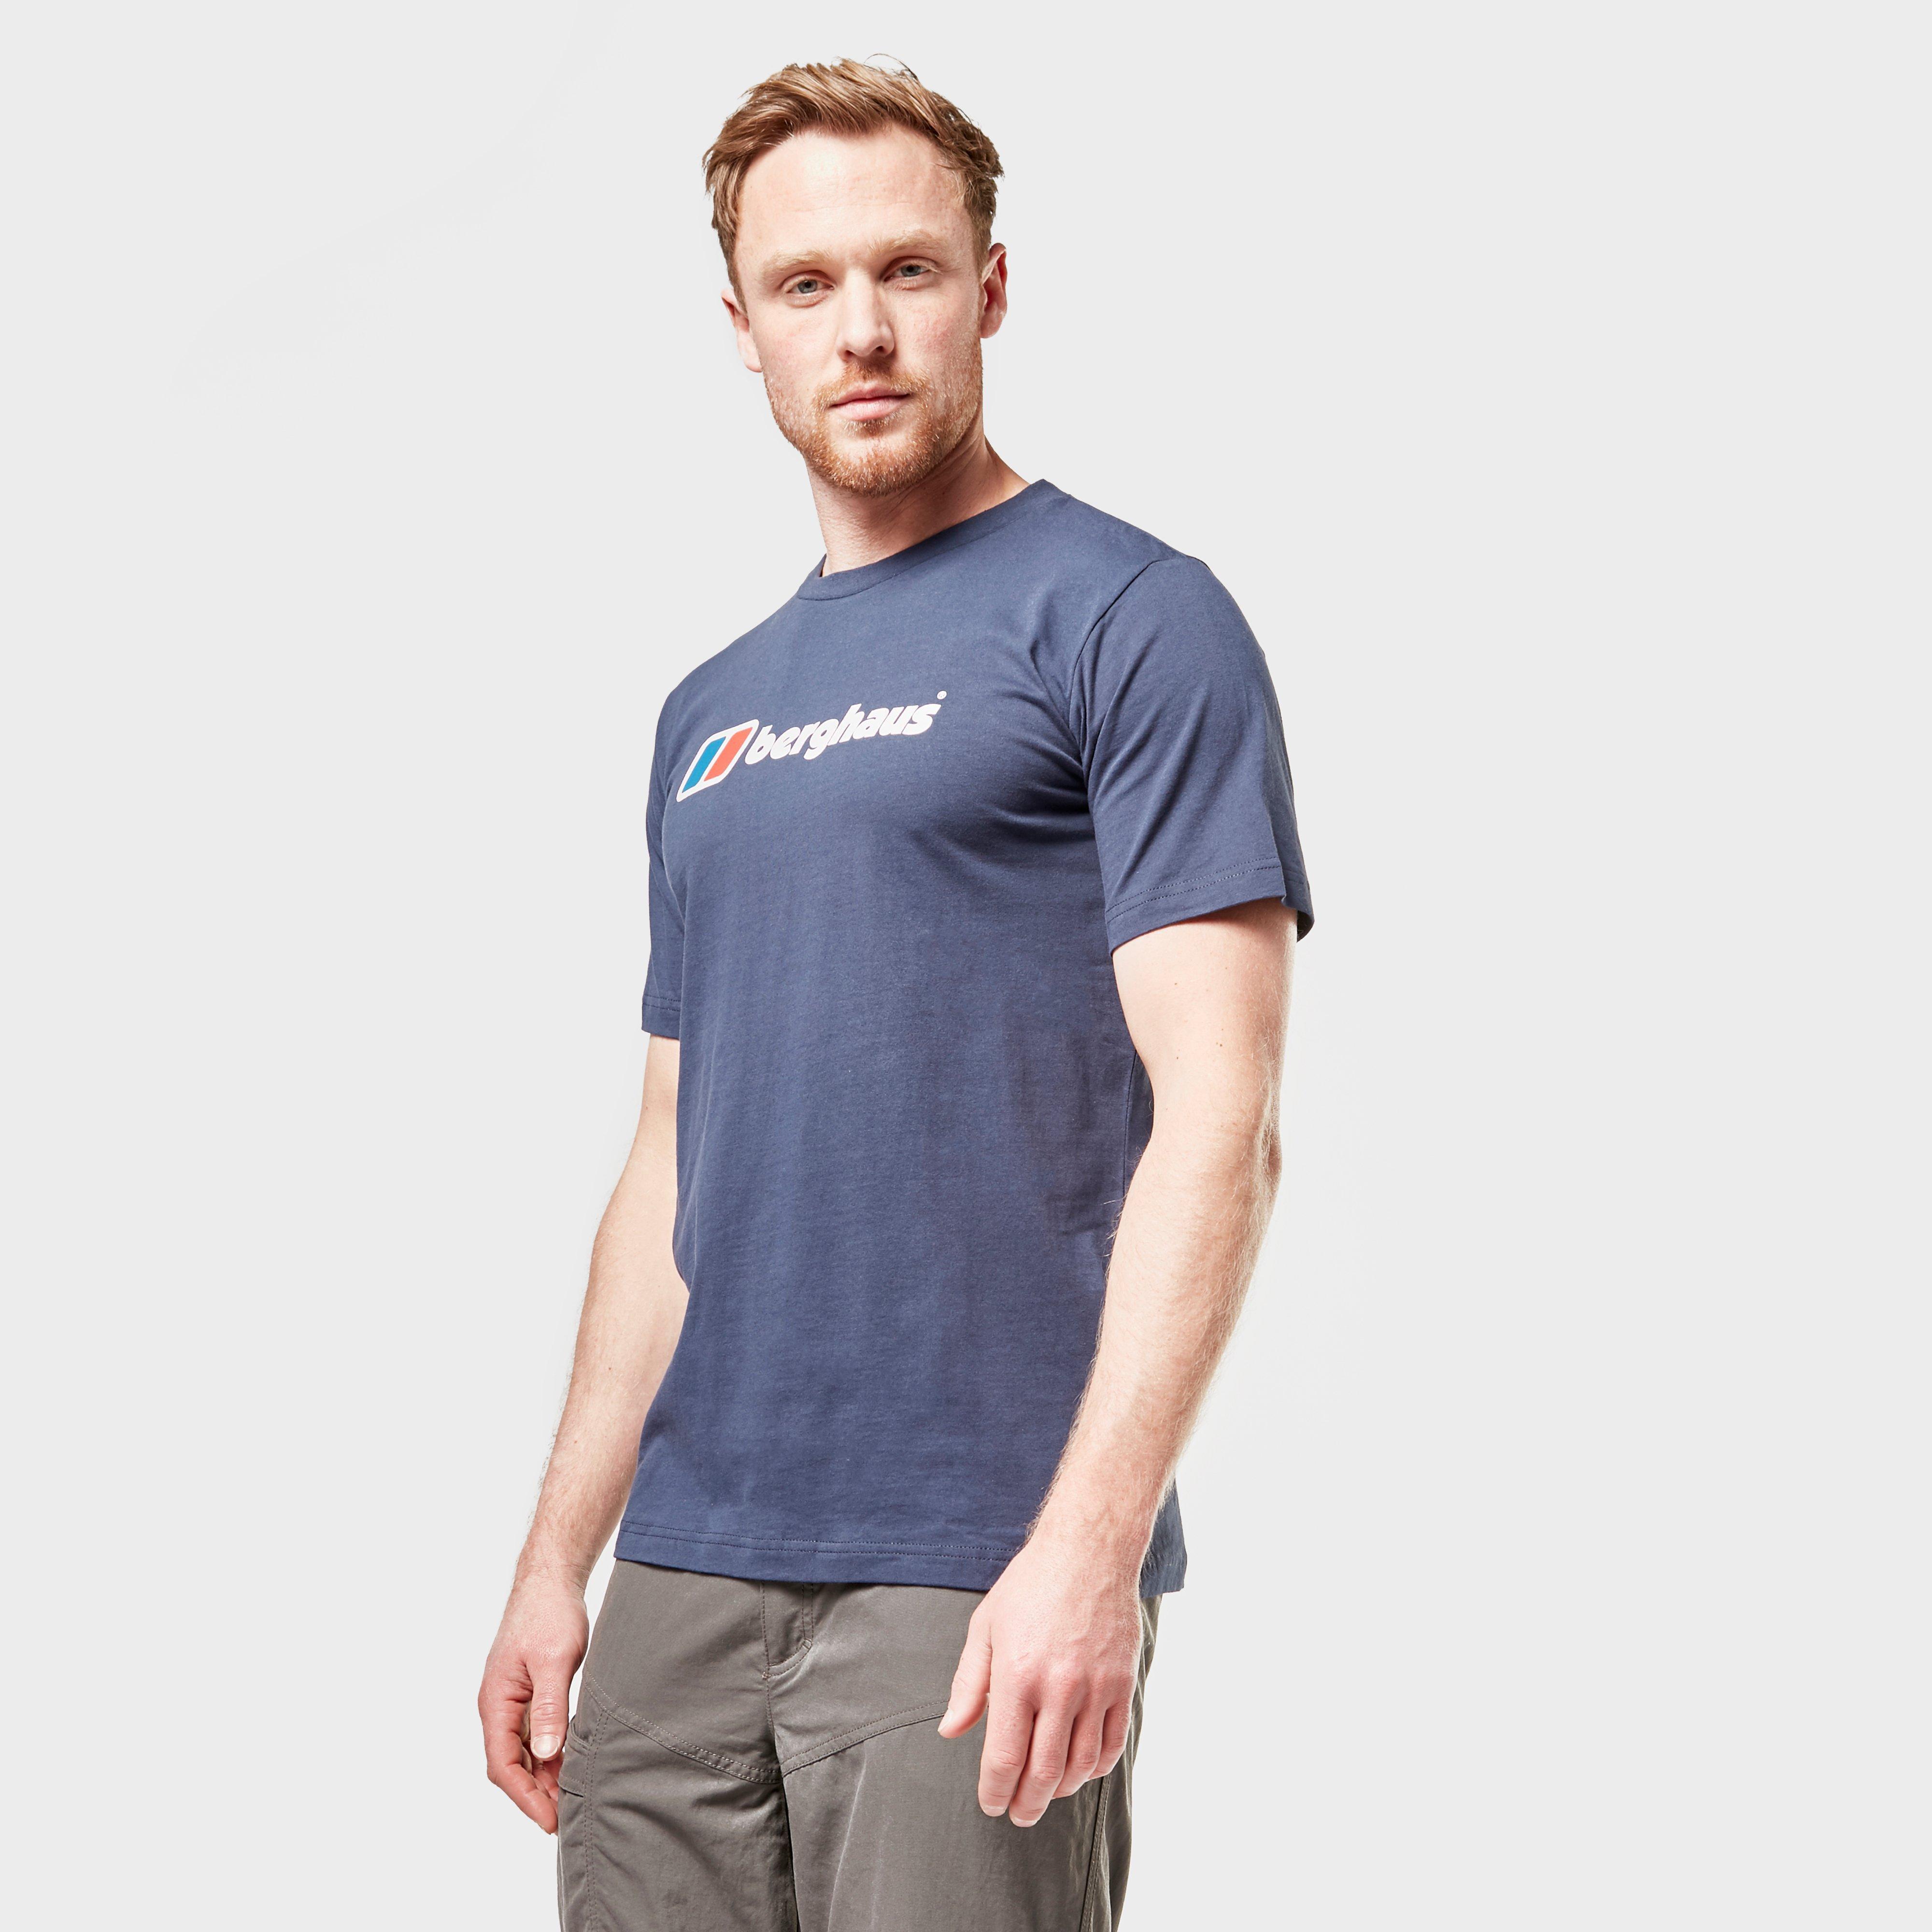 Berghaus Mens Corporate Logo T-shirt - Navy/navy  Navy/navy